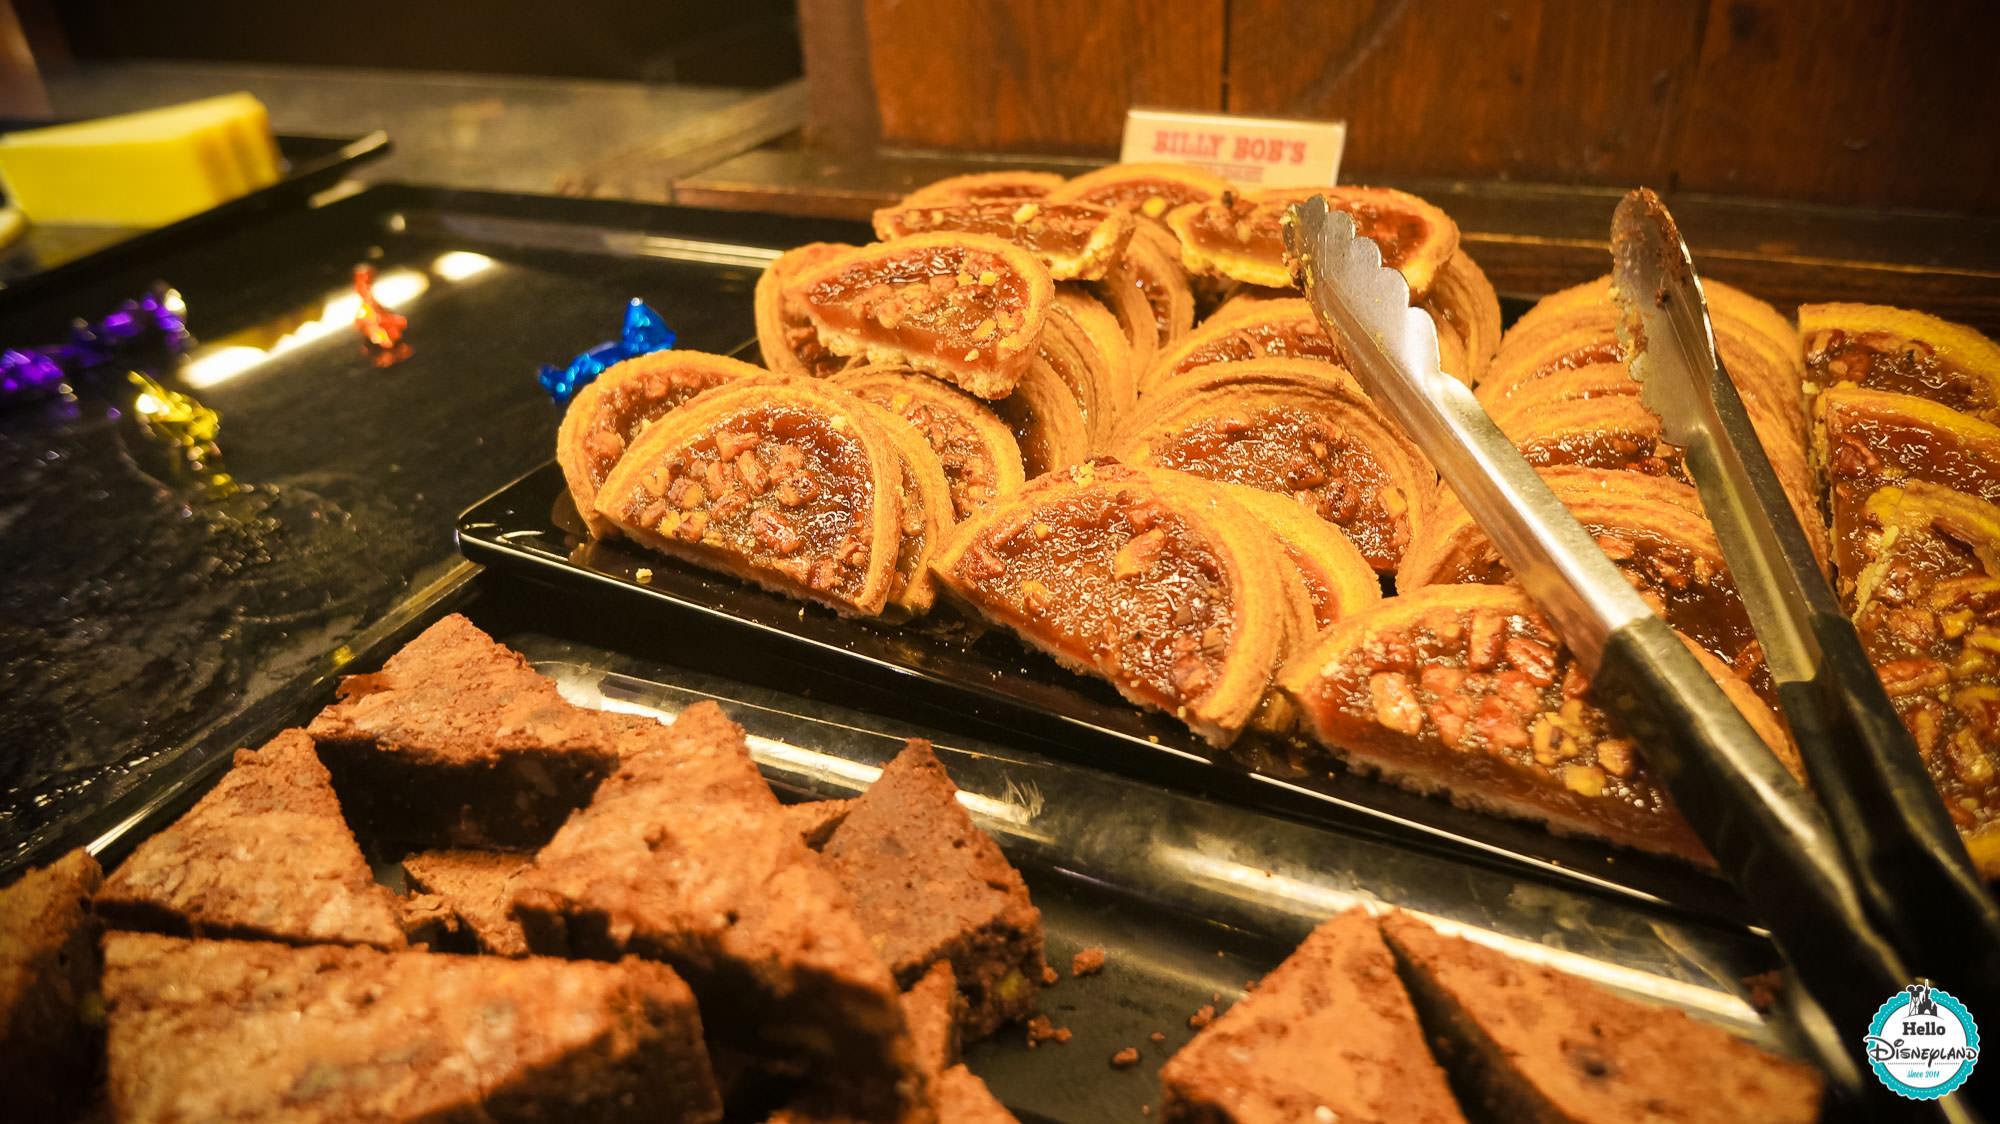 Paradise Cafe And Bakery Menu